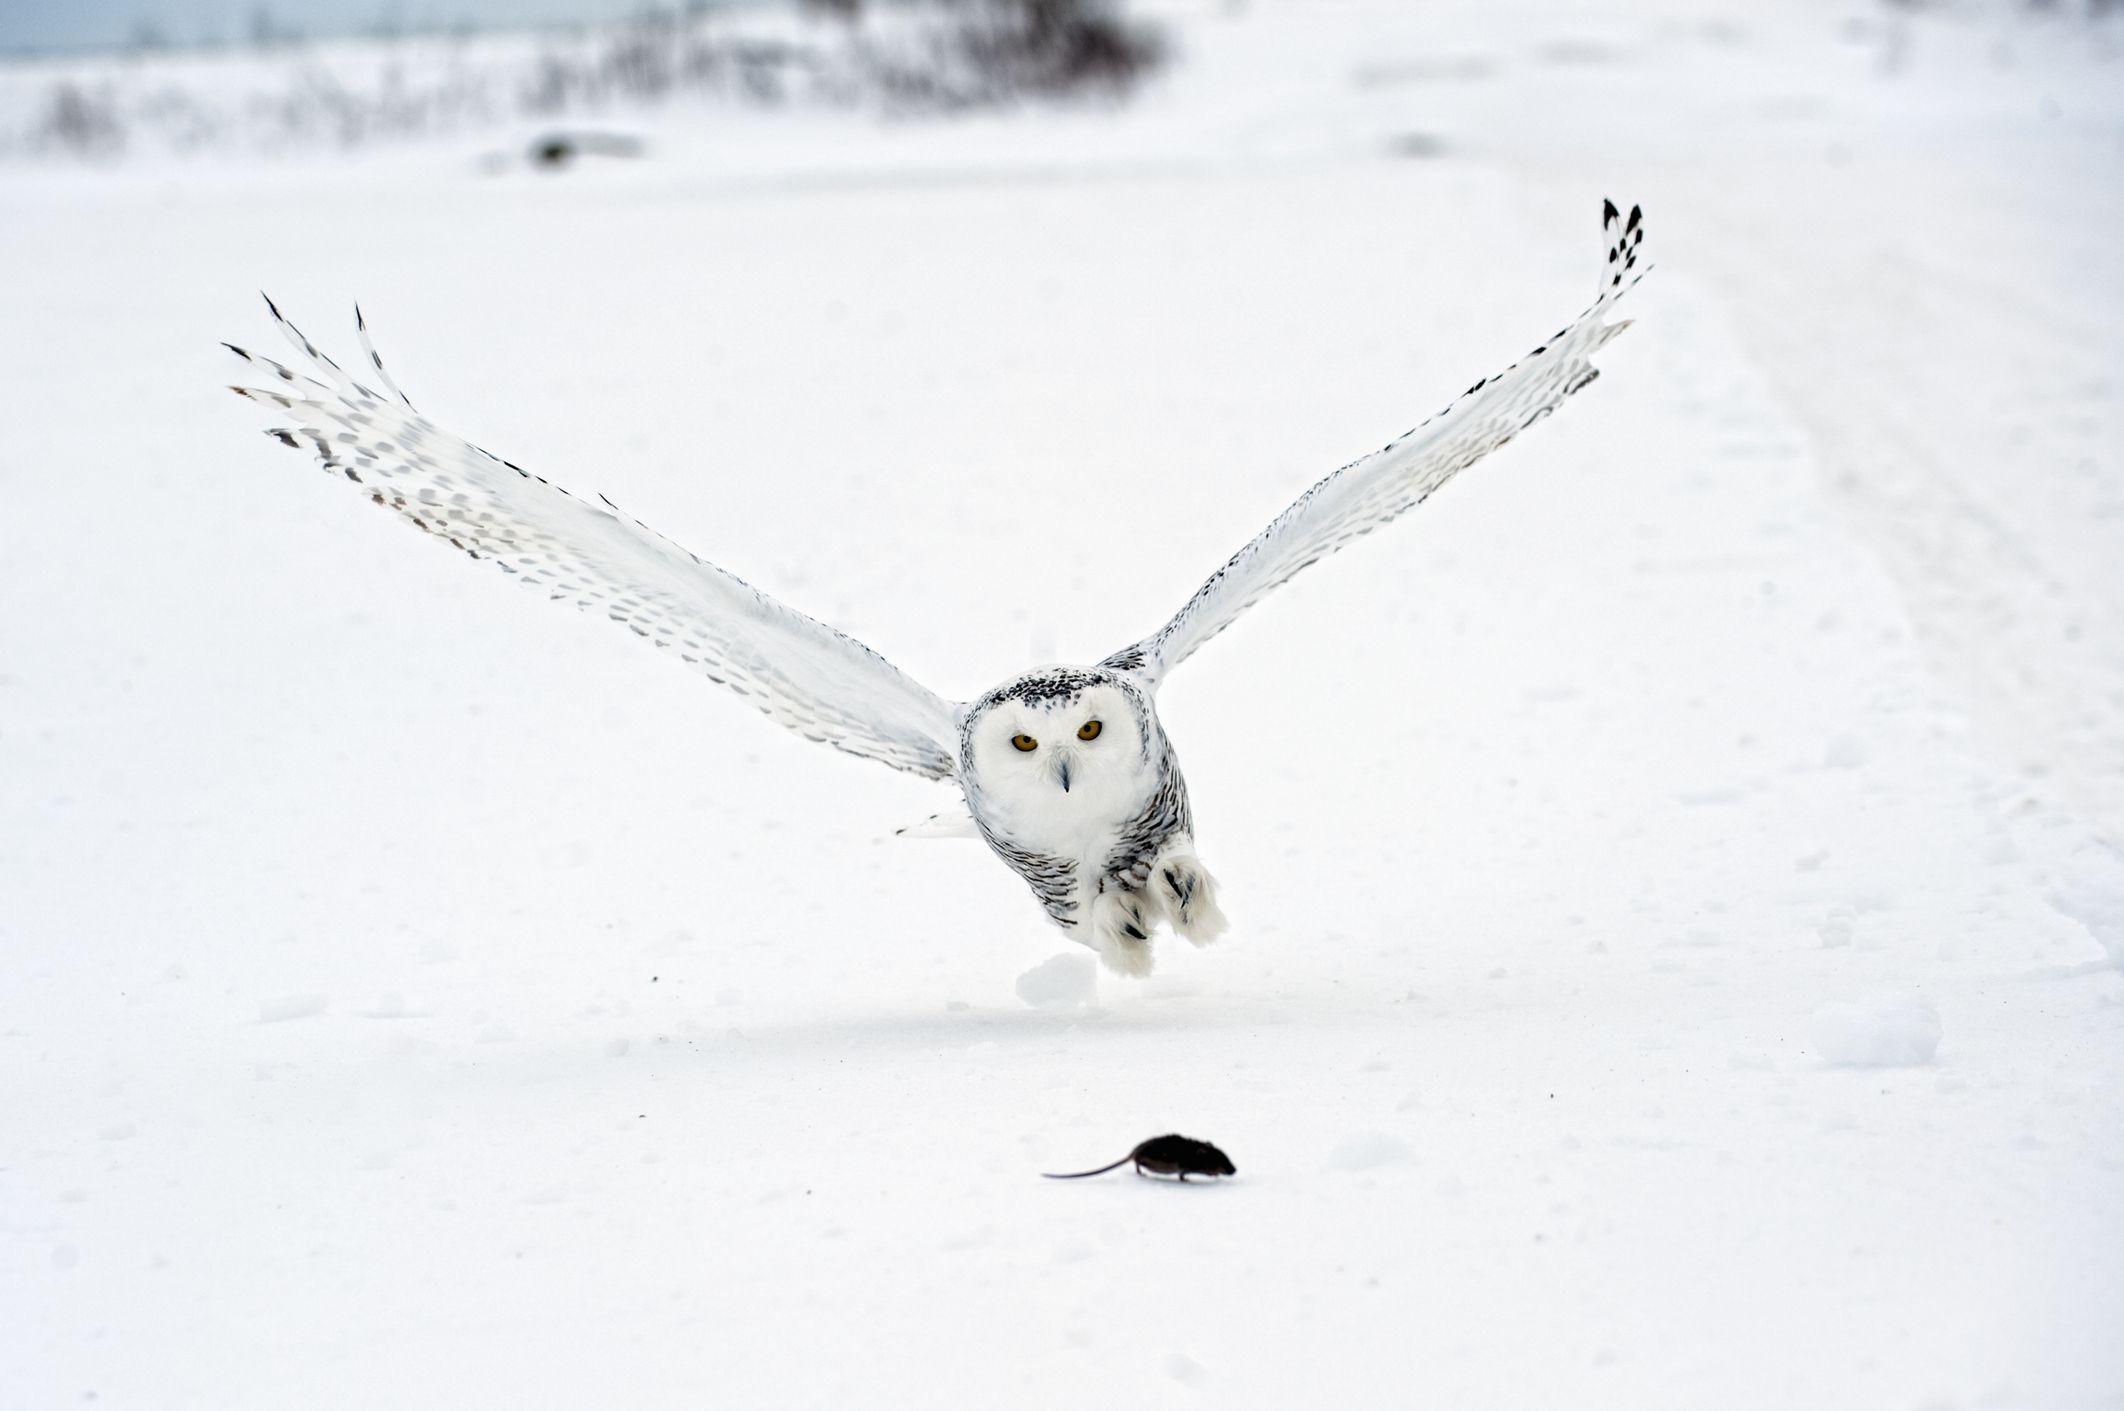 Snowy Owl (Nyctea scandiaca) swooping in on lemming prey